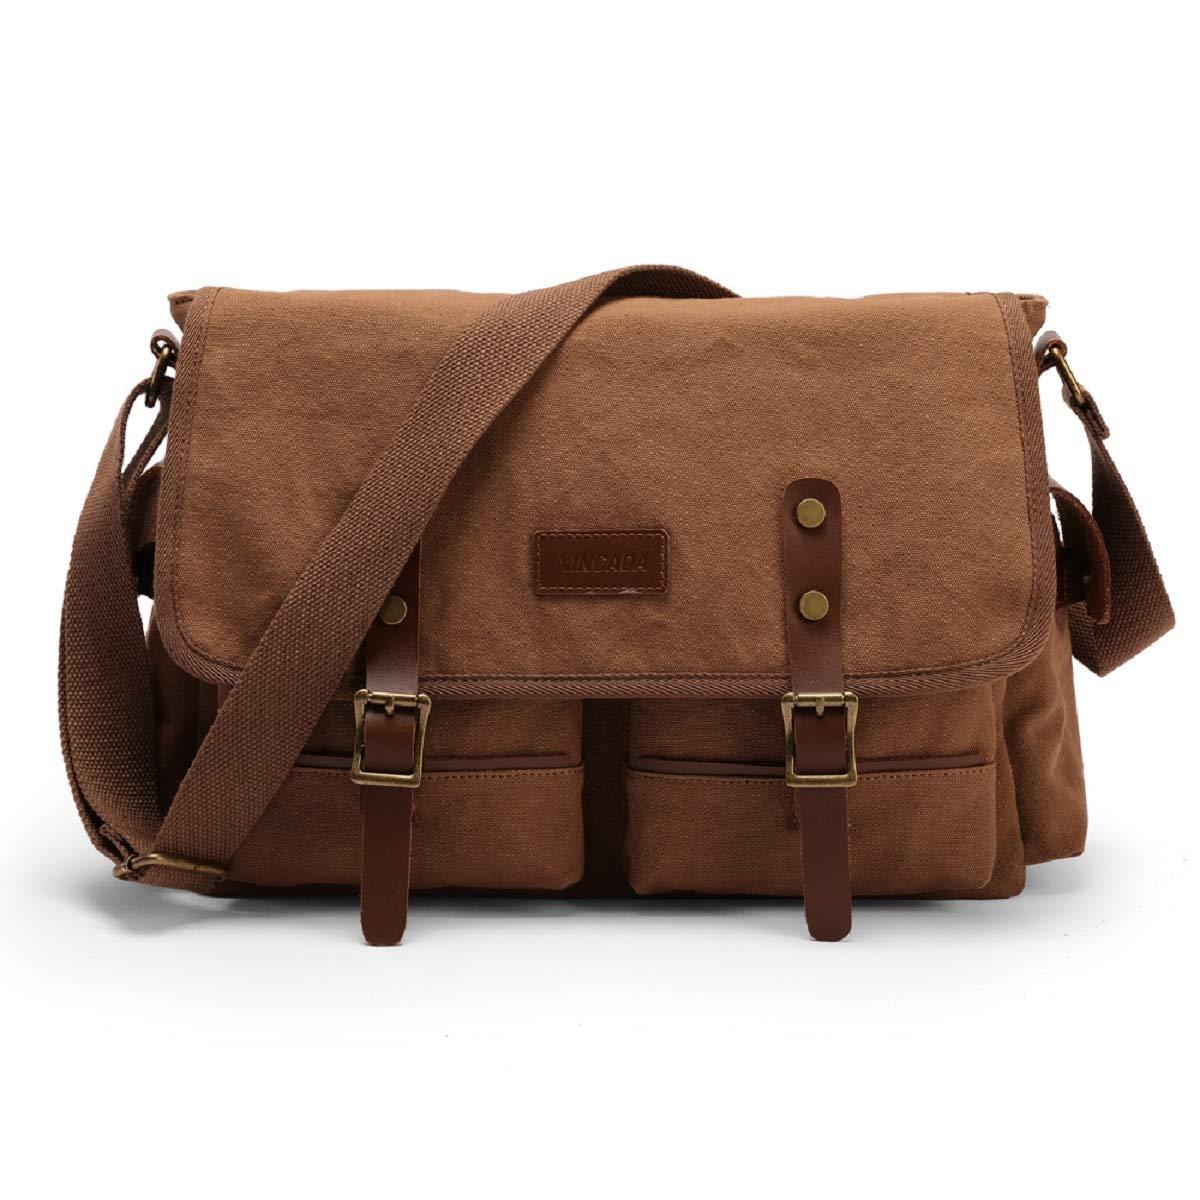 XINCADA Vintage Canvas Bag Messenger Bag Laptop Shoulder Bags Satchel School Bag for Men